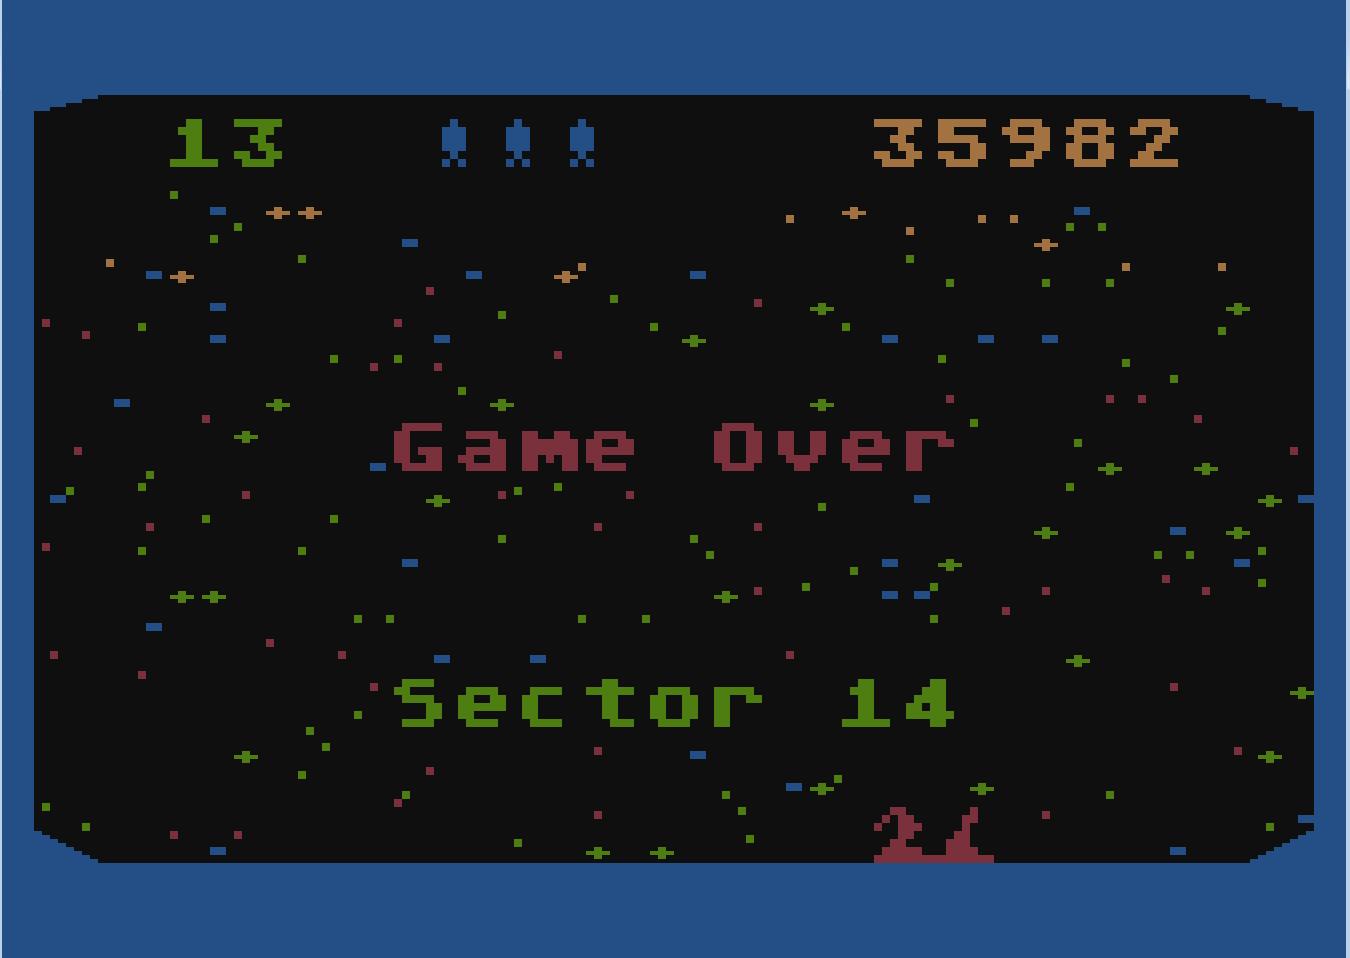 Liduario: Beamrider (Atari 400/800/XL/XE Emulated) 35,982 points on 2014-10-19 11:42:22